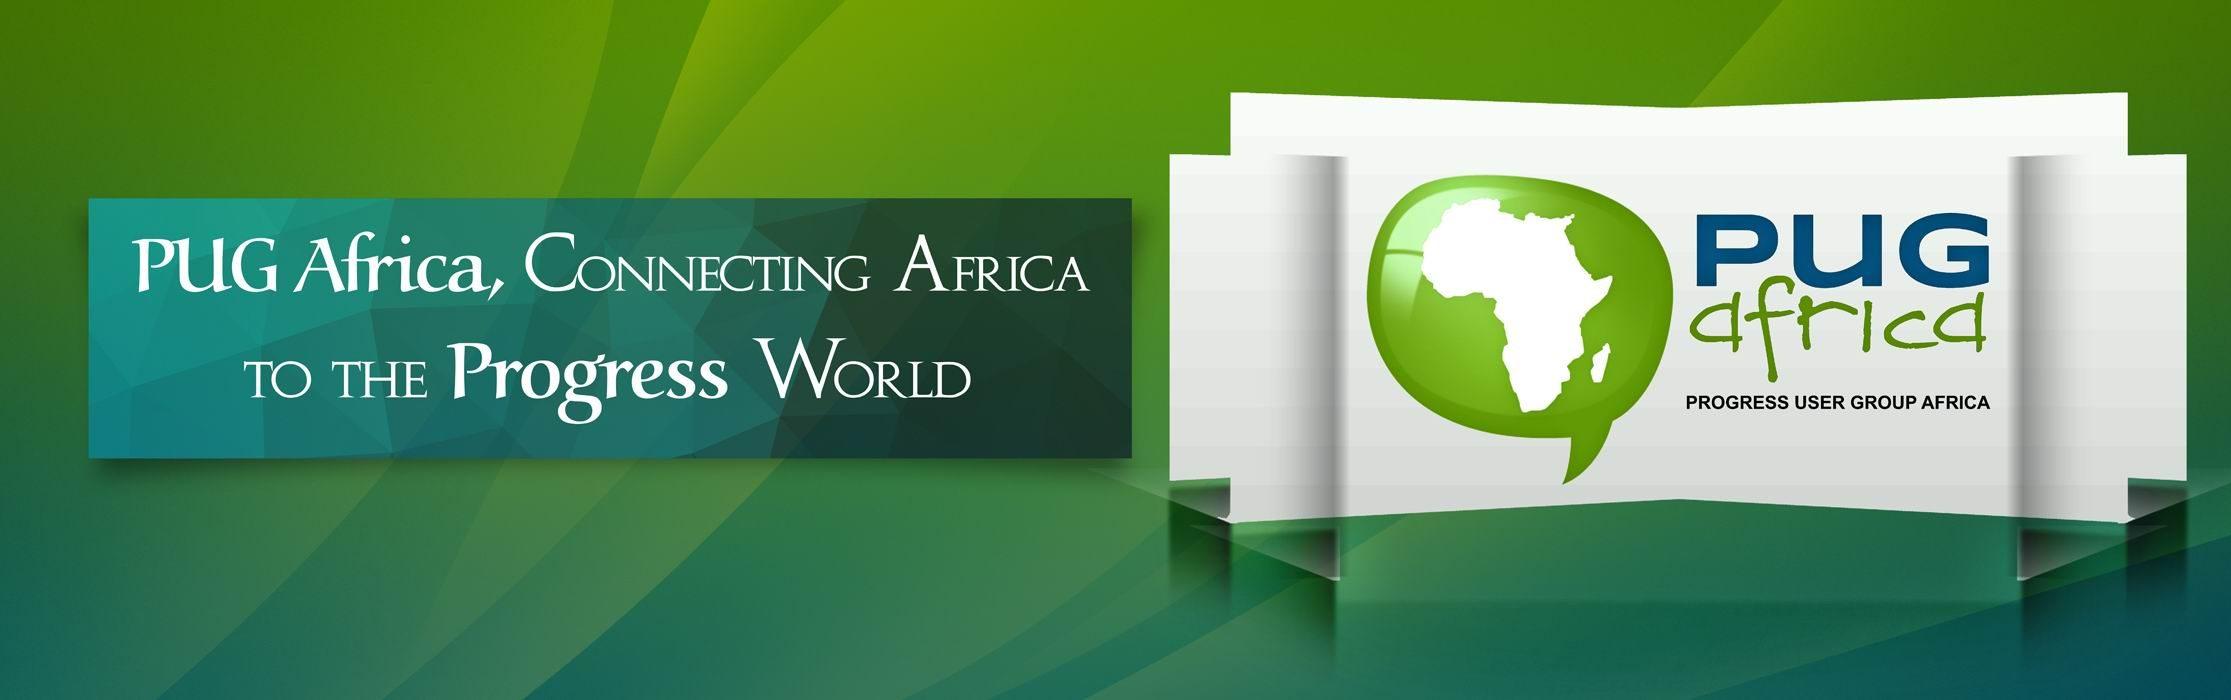 PUG Africa